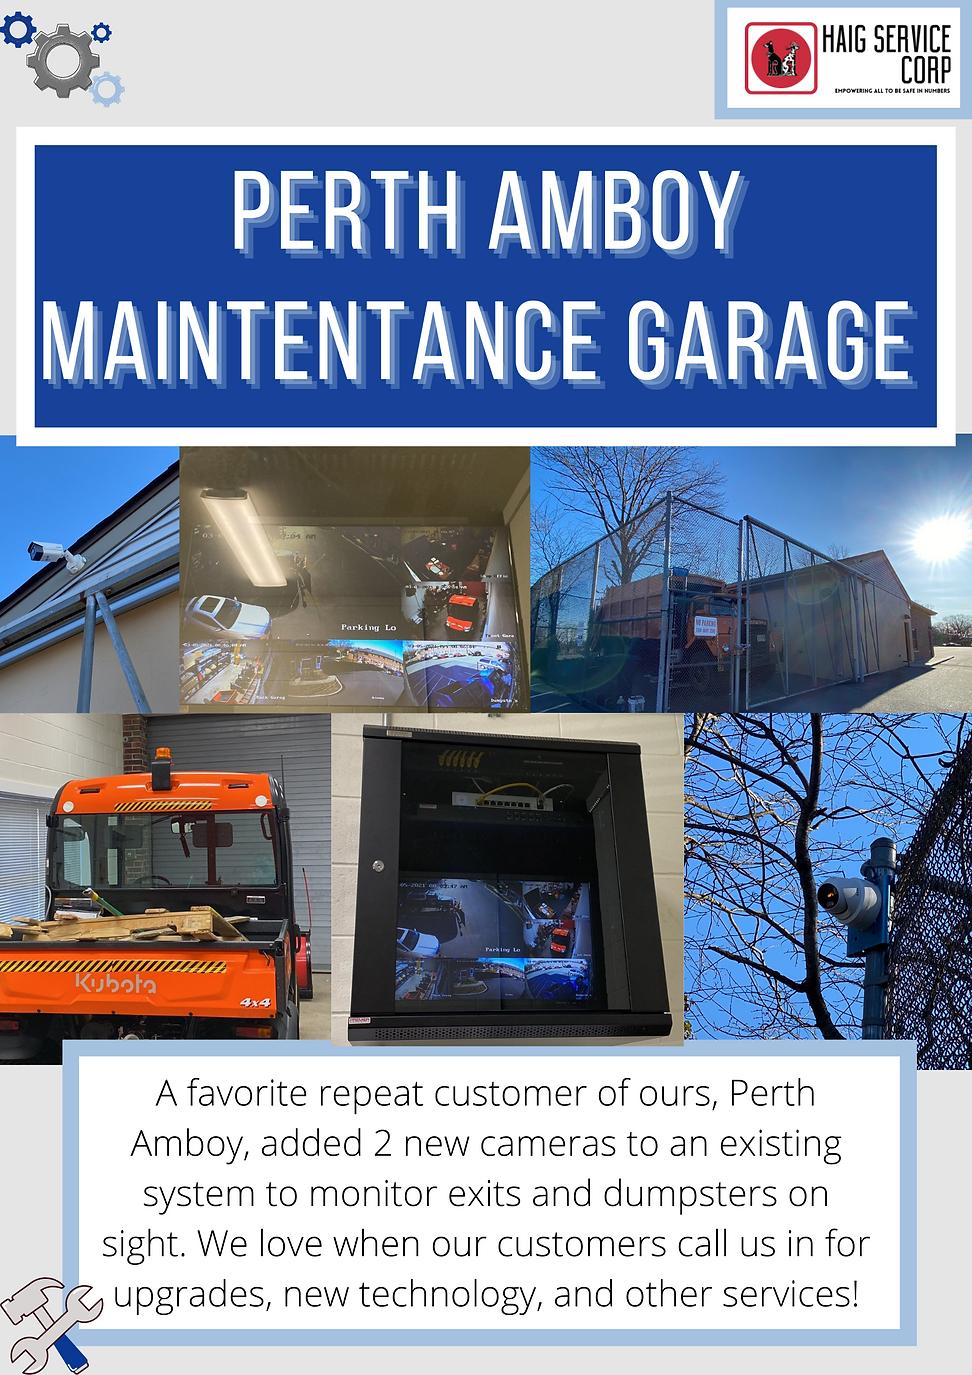 Perth Amboy Maintenance Garage.png